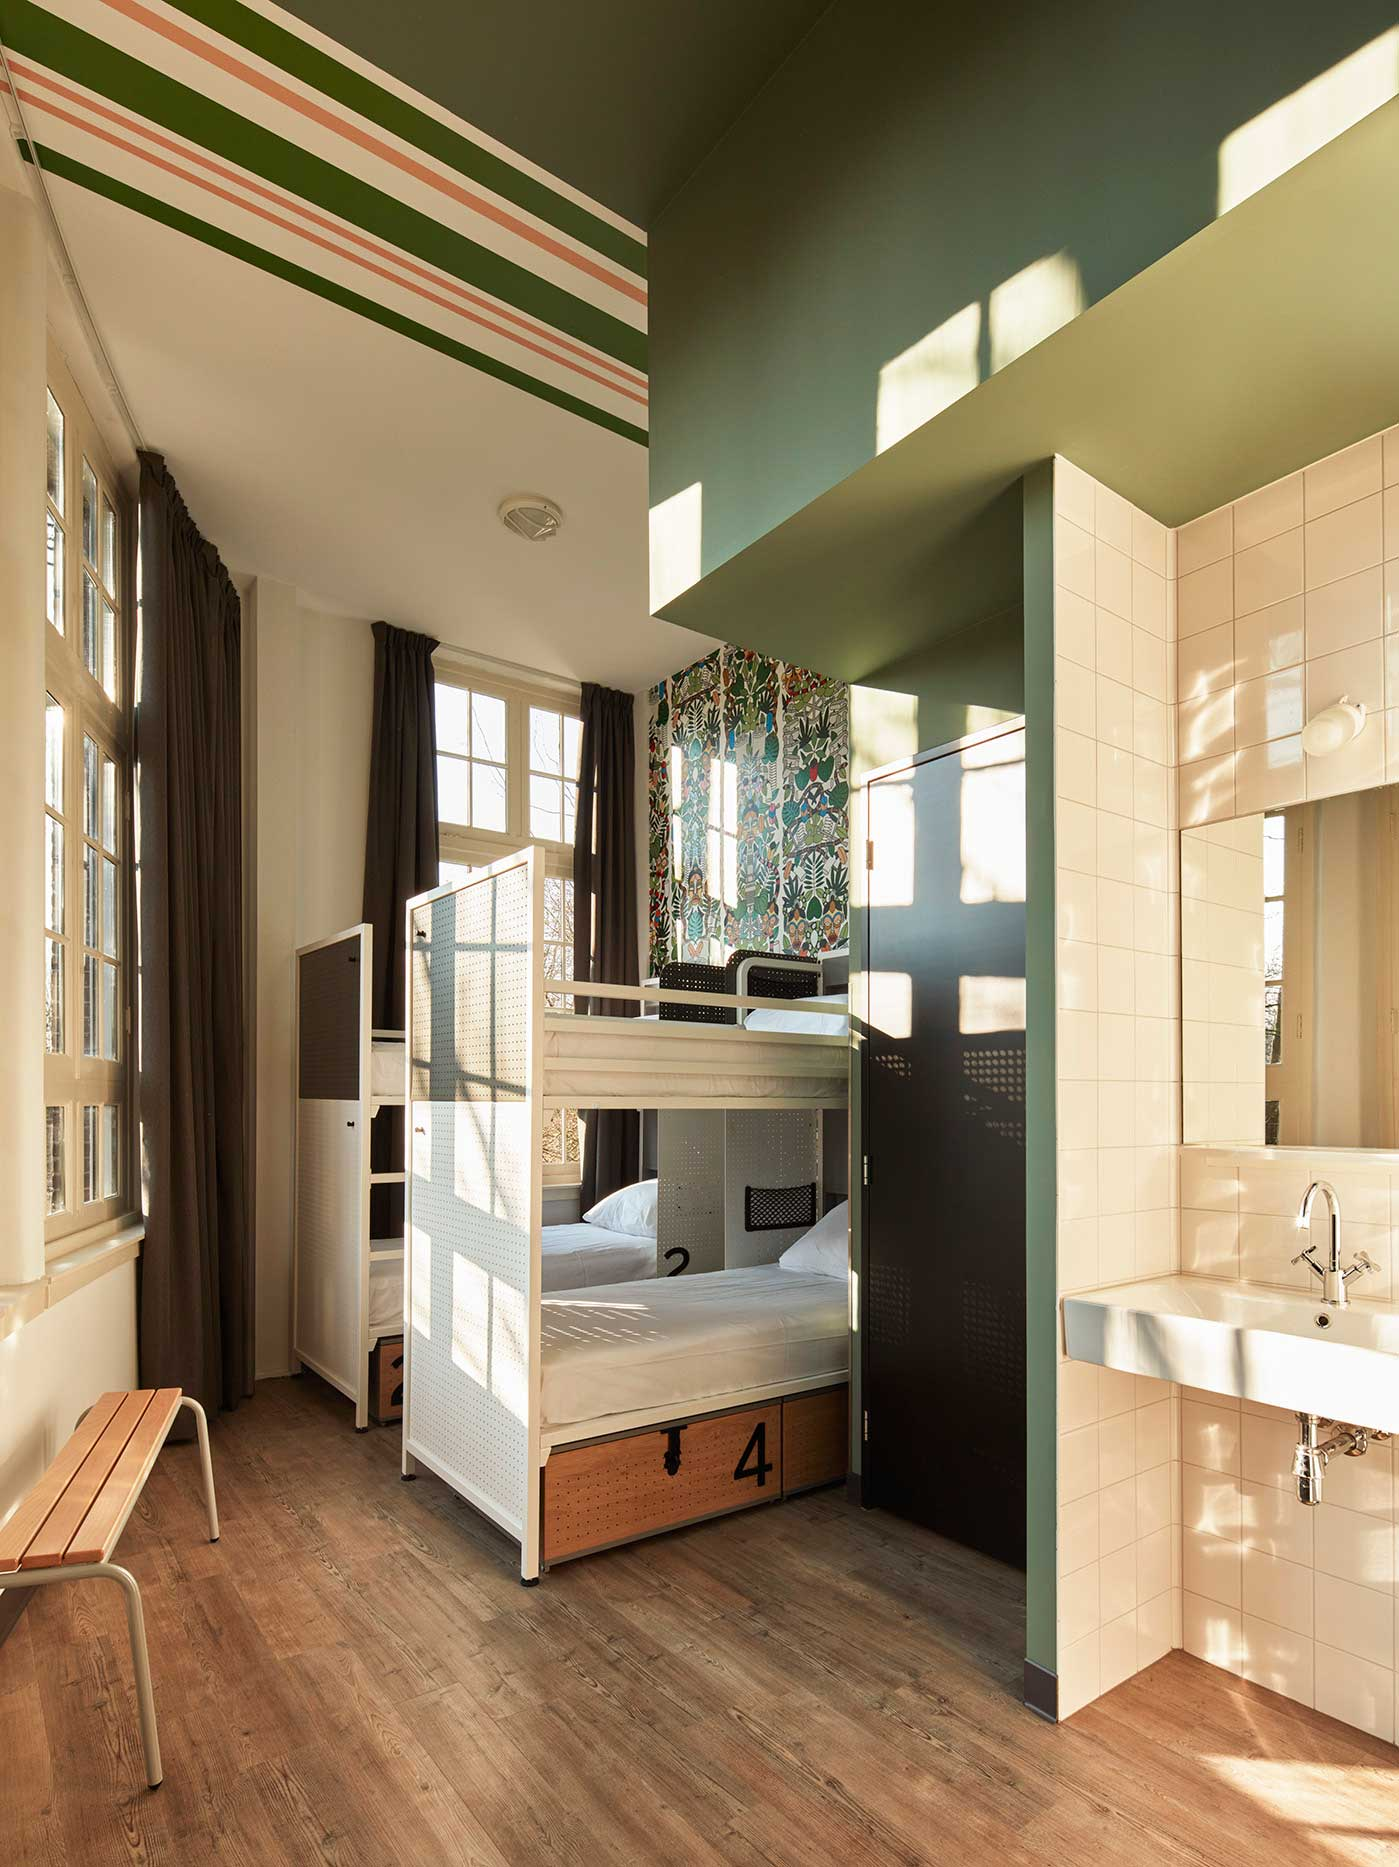 Hostel Generator-Amsterdam 12